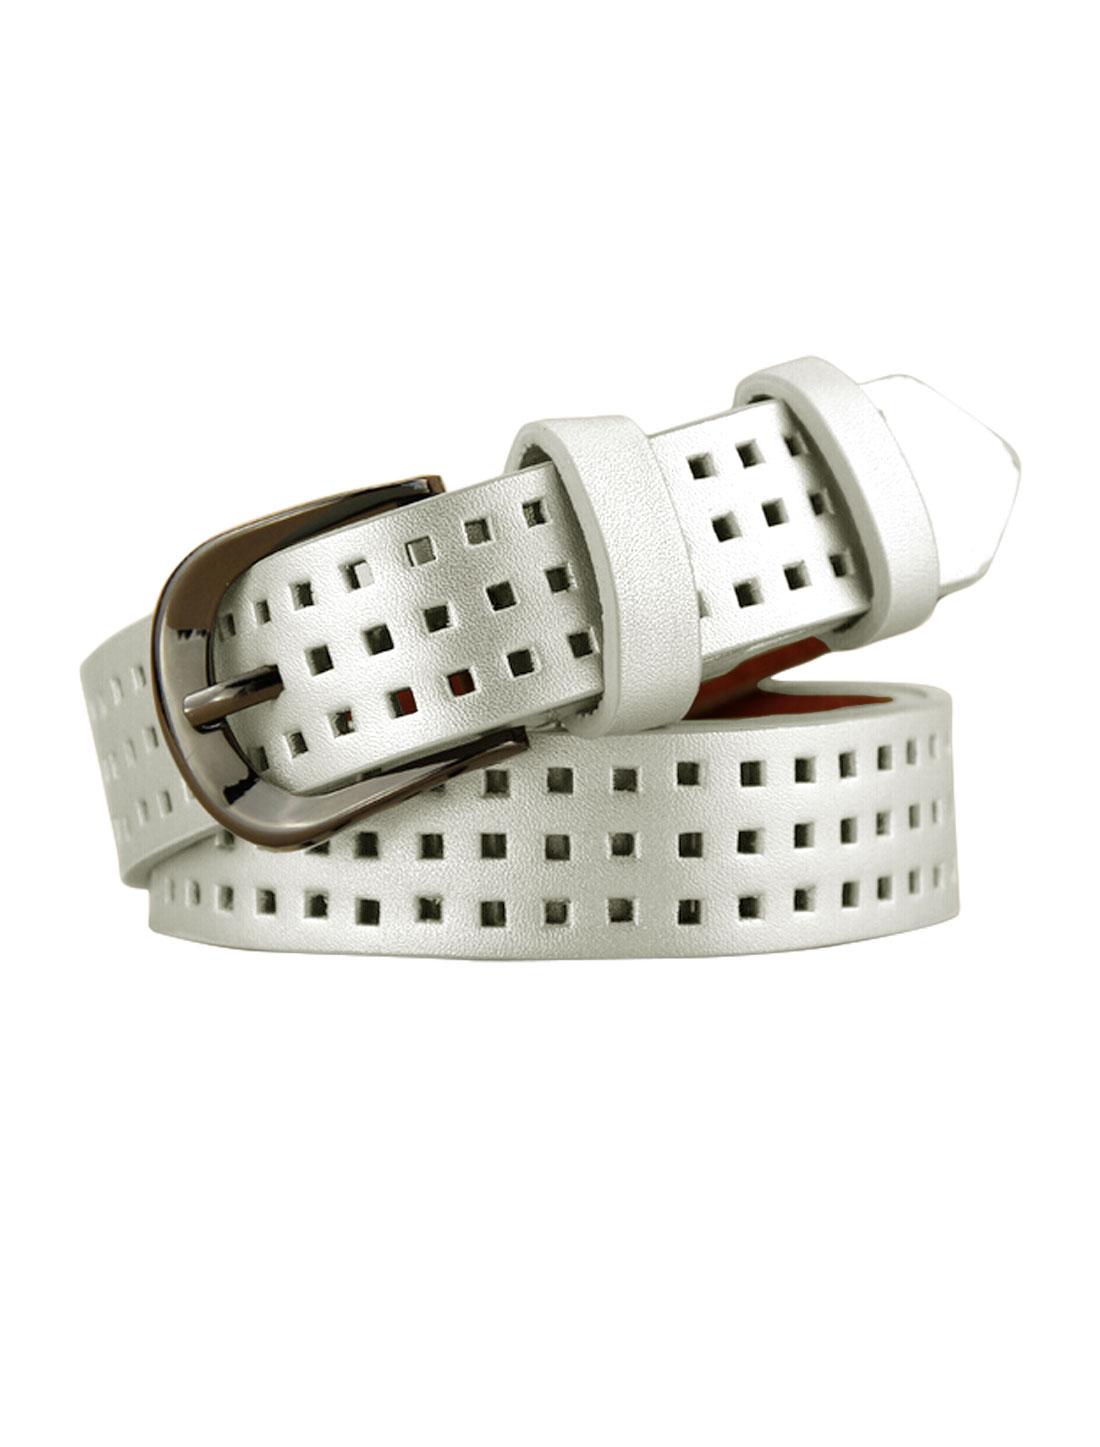 Women Single Pin Buckle Adjustable Hollow Out PU Belt Silver